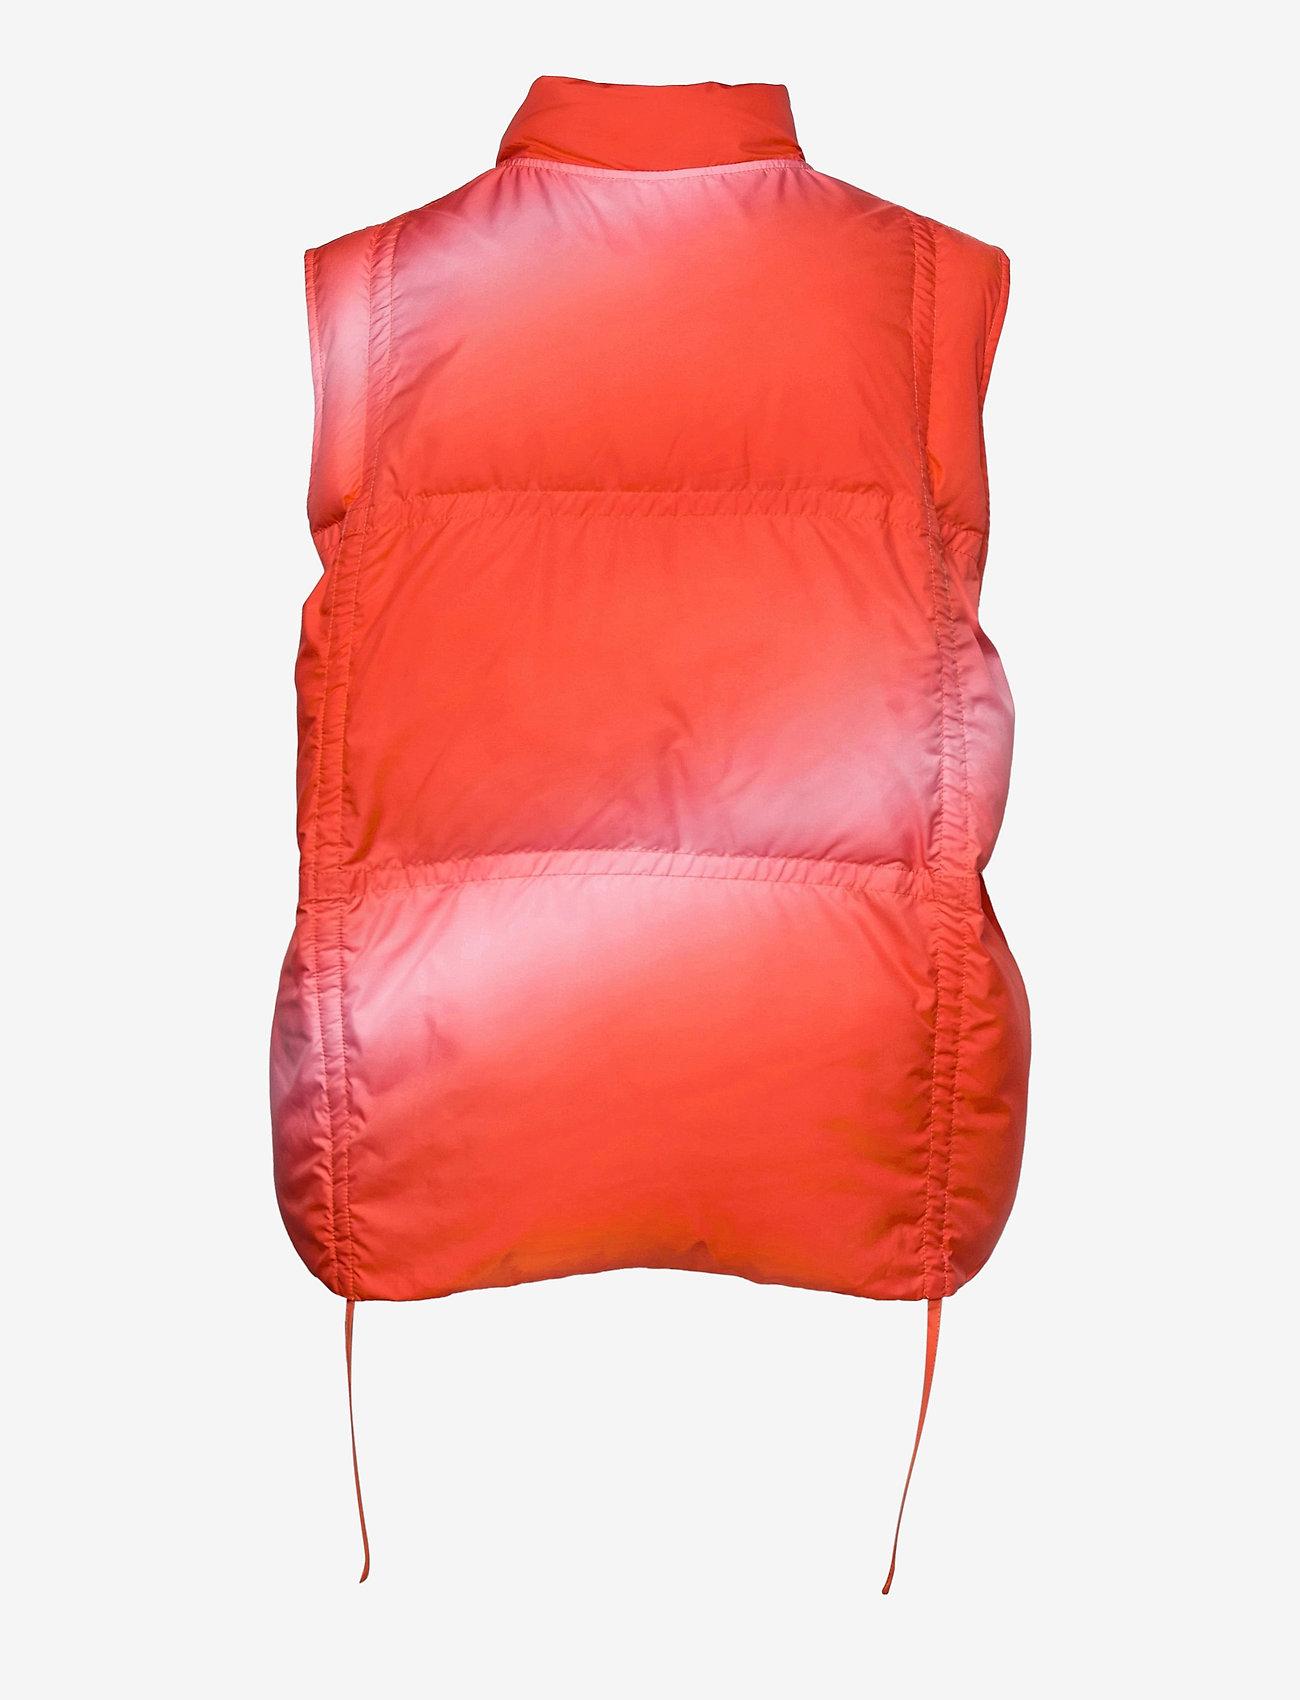 Hosbjerg - CATH DONNA TAMARA VEST - puffer vests - red fade - 1